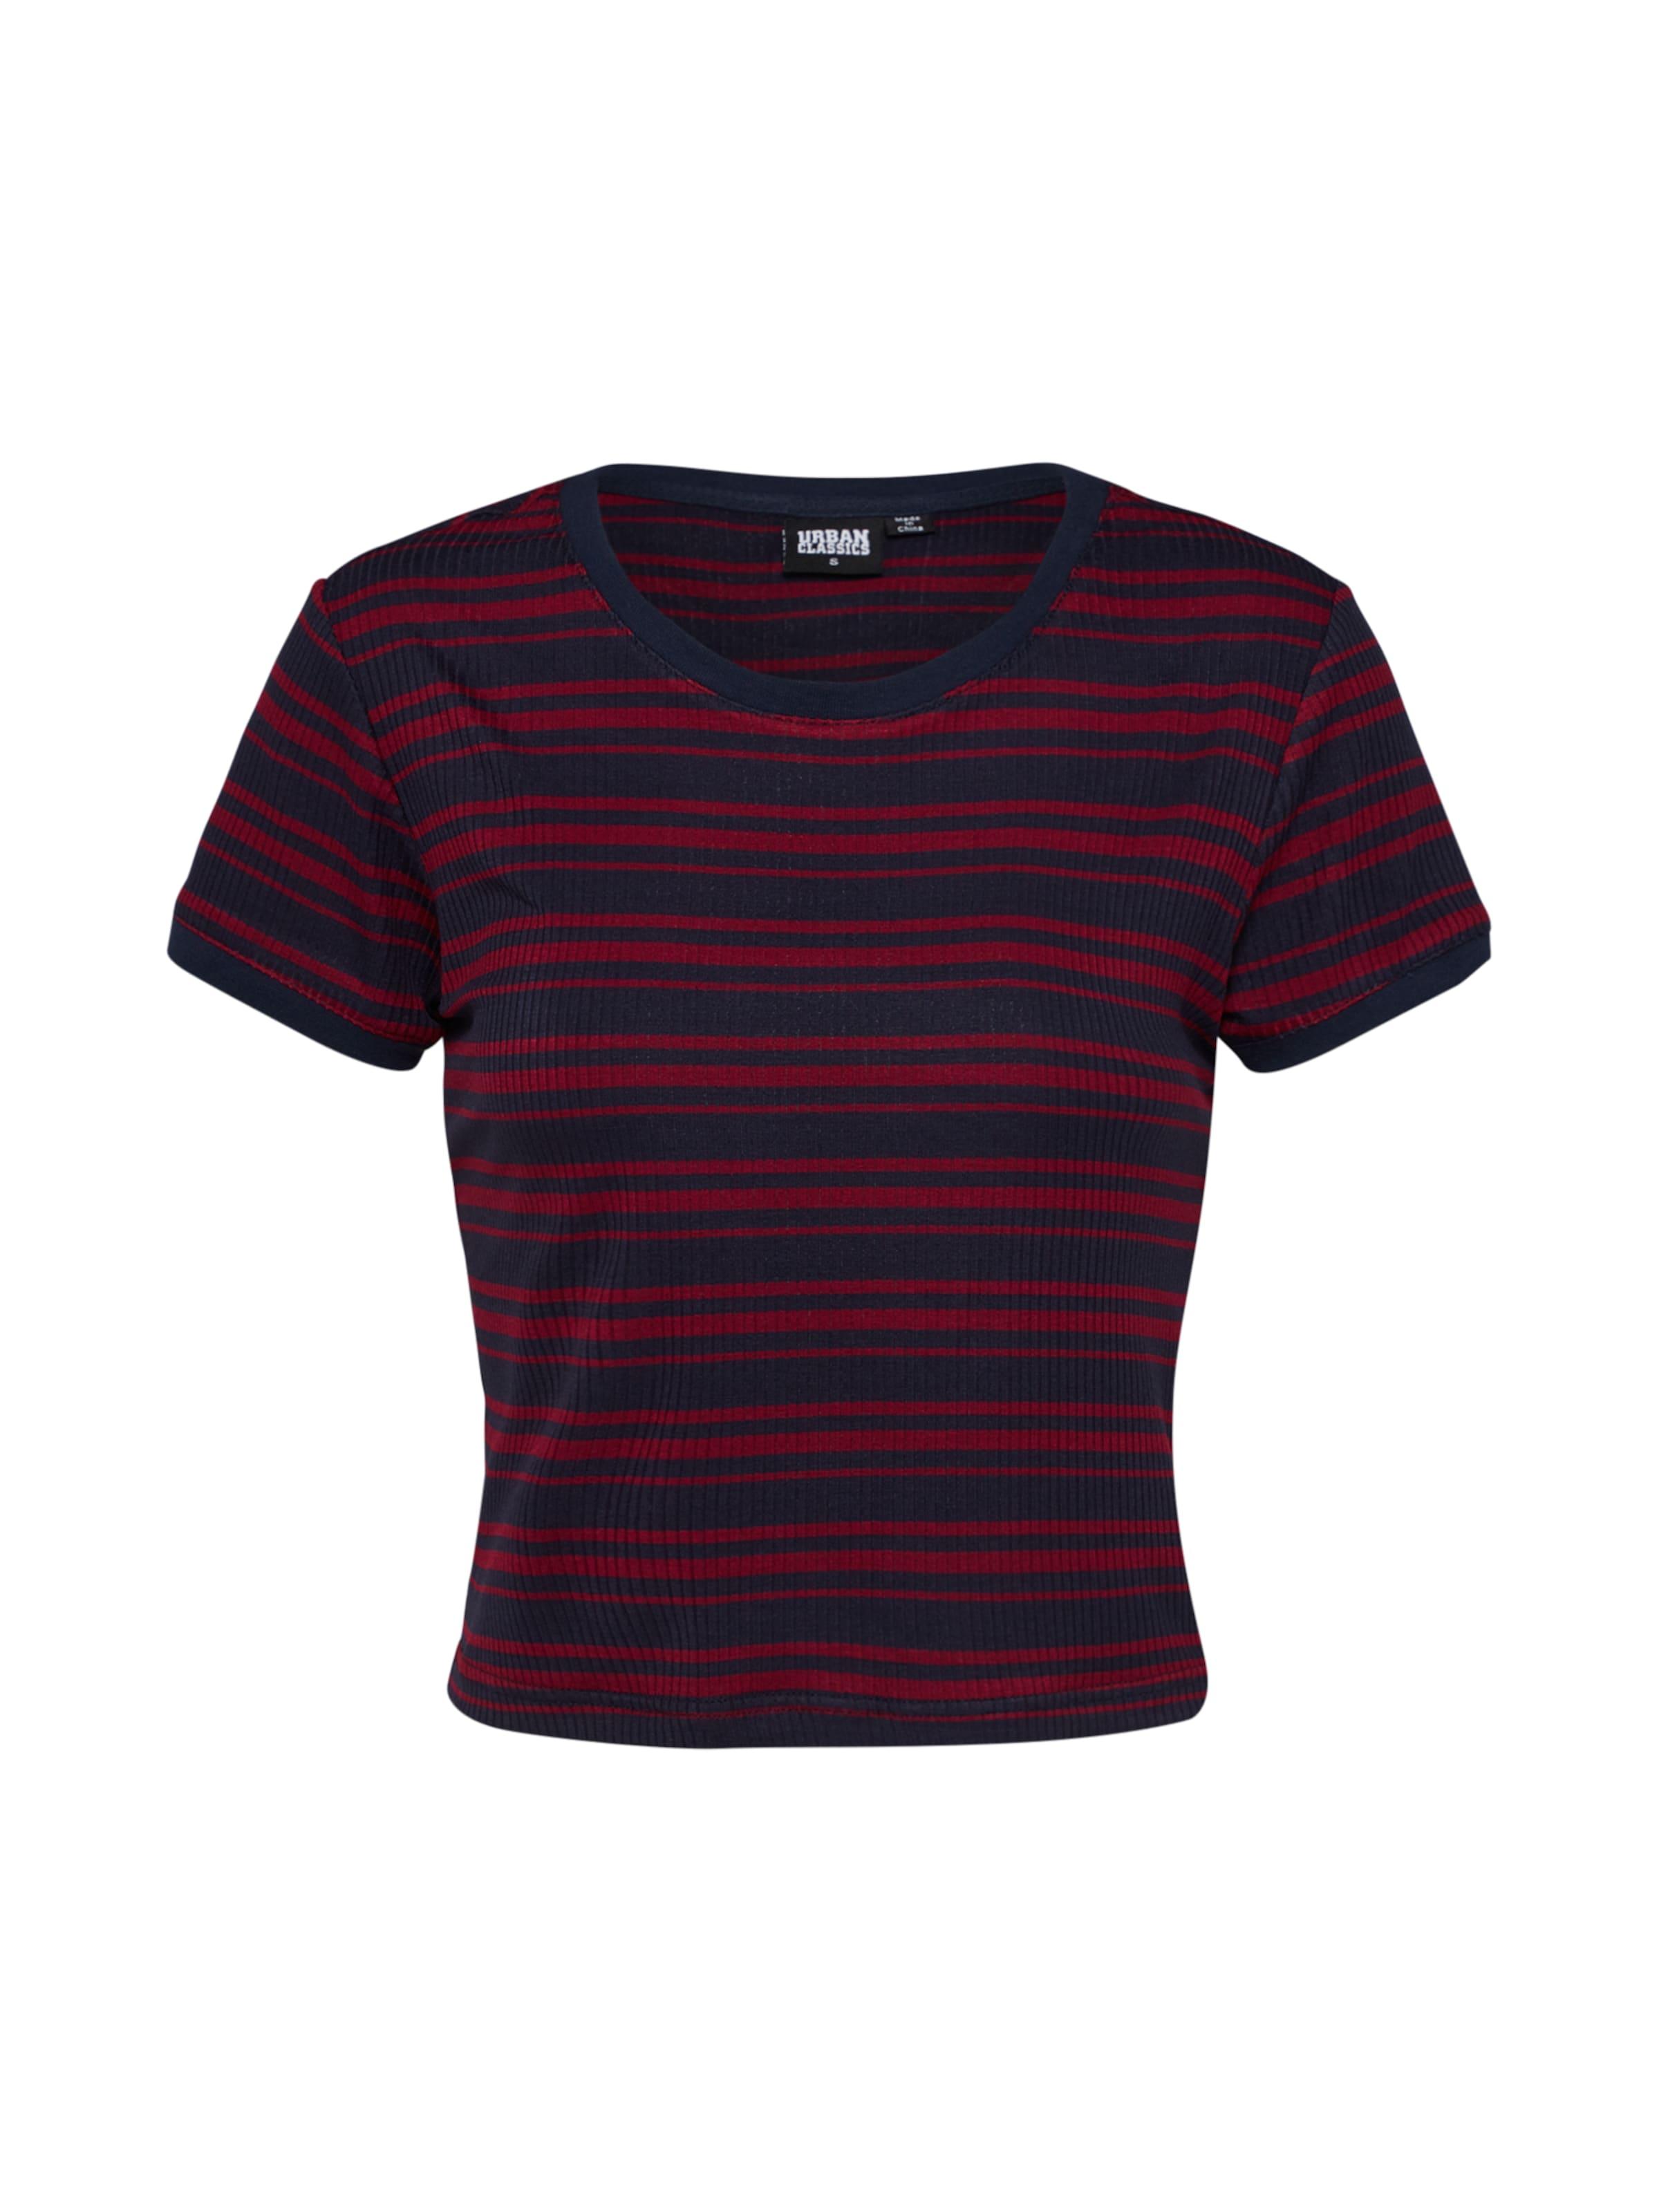 Urban shirt Classics NavyKirschrot In T 8mnNv0wO